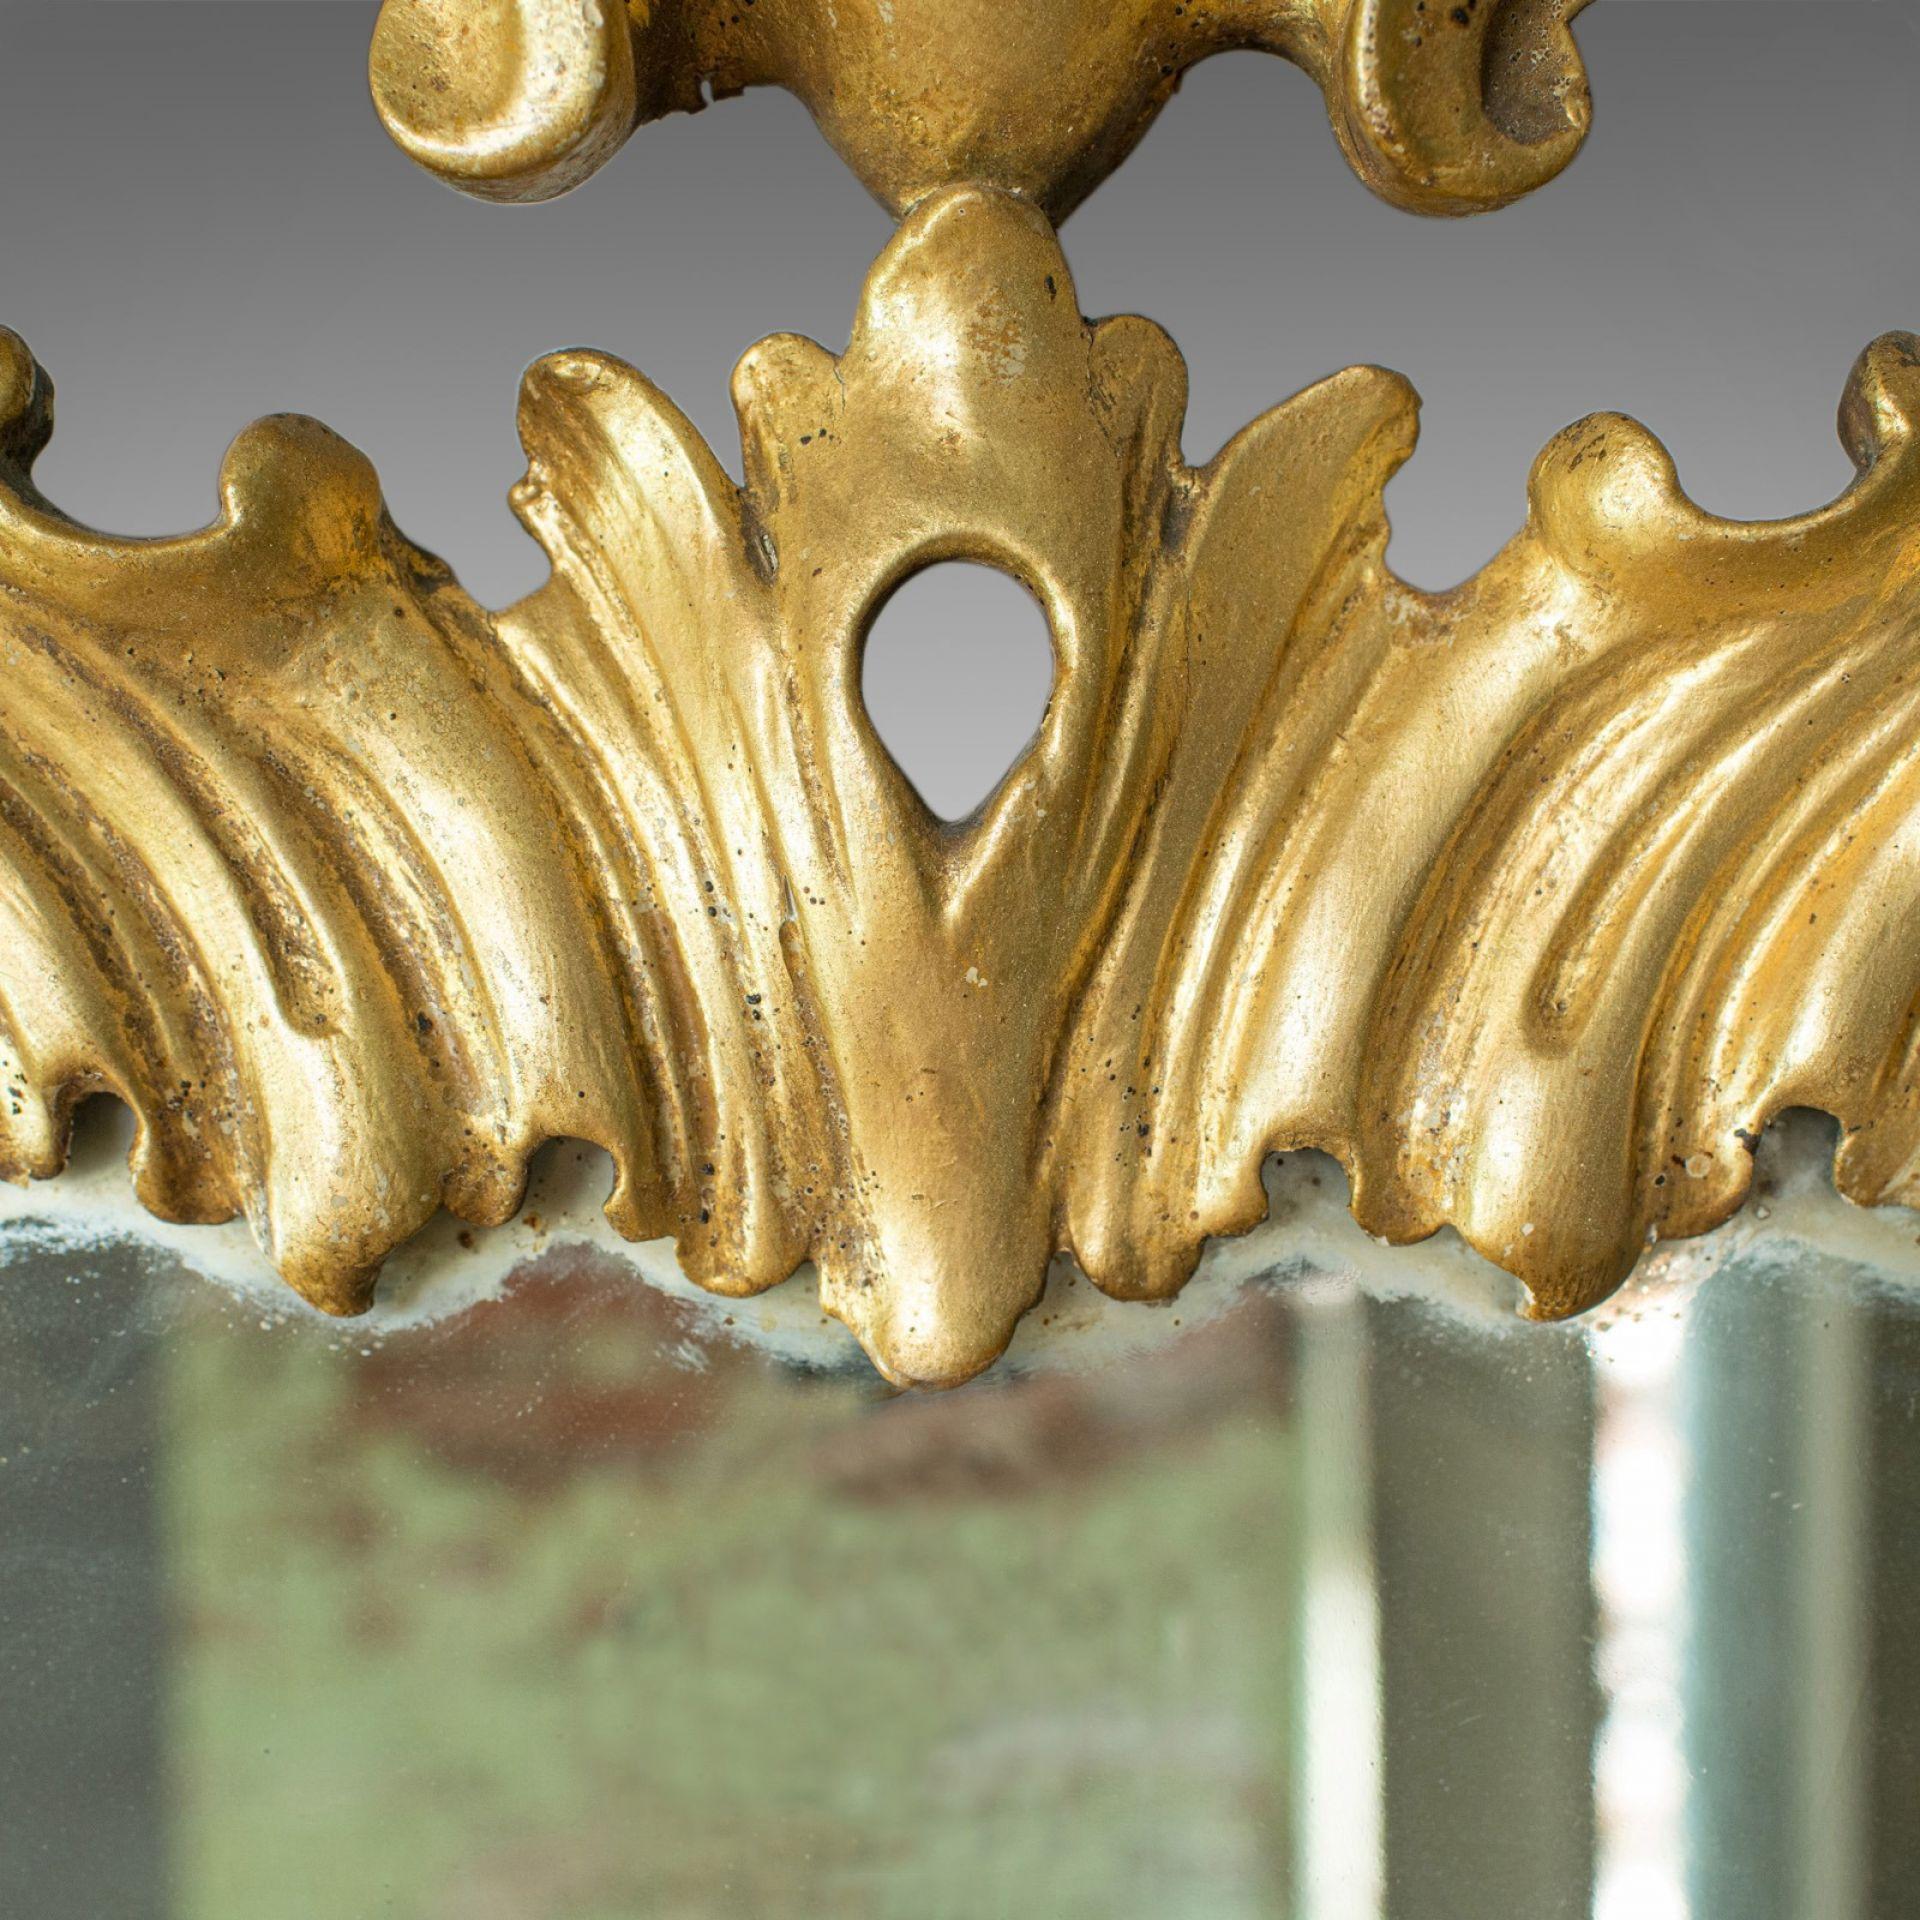 Antique Wall Mirror, English, Victorian, Gilt Gesso, Classical Taste, Circa 1890